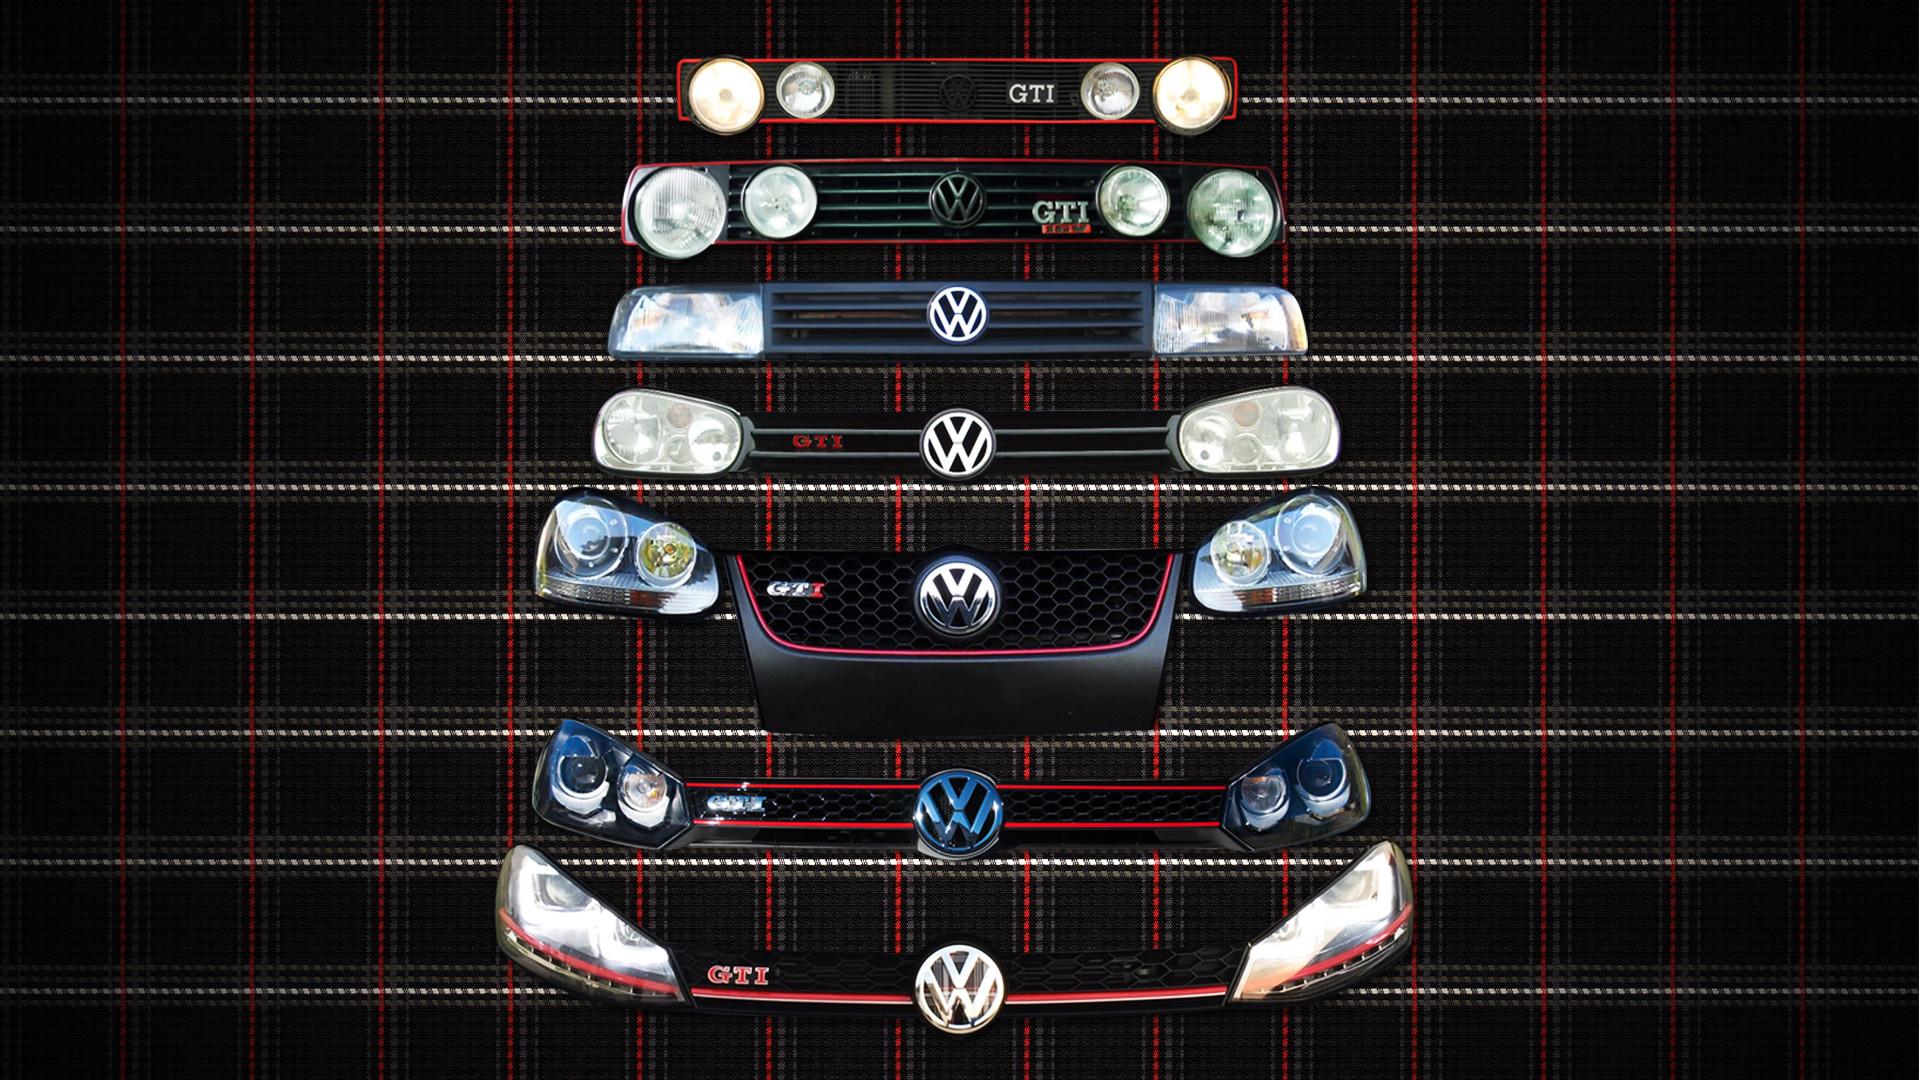 Res: 1920x1080, VW Logo Wallpaper - WallpaperSafari